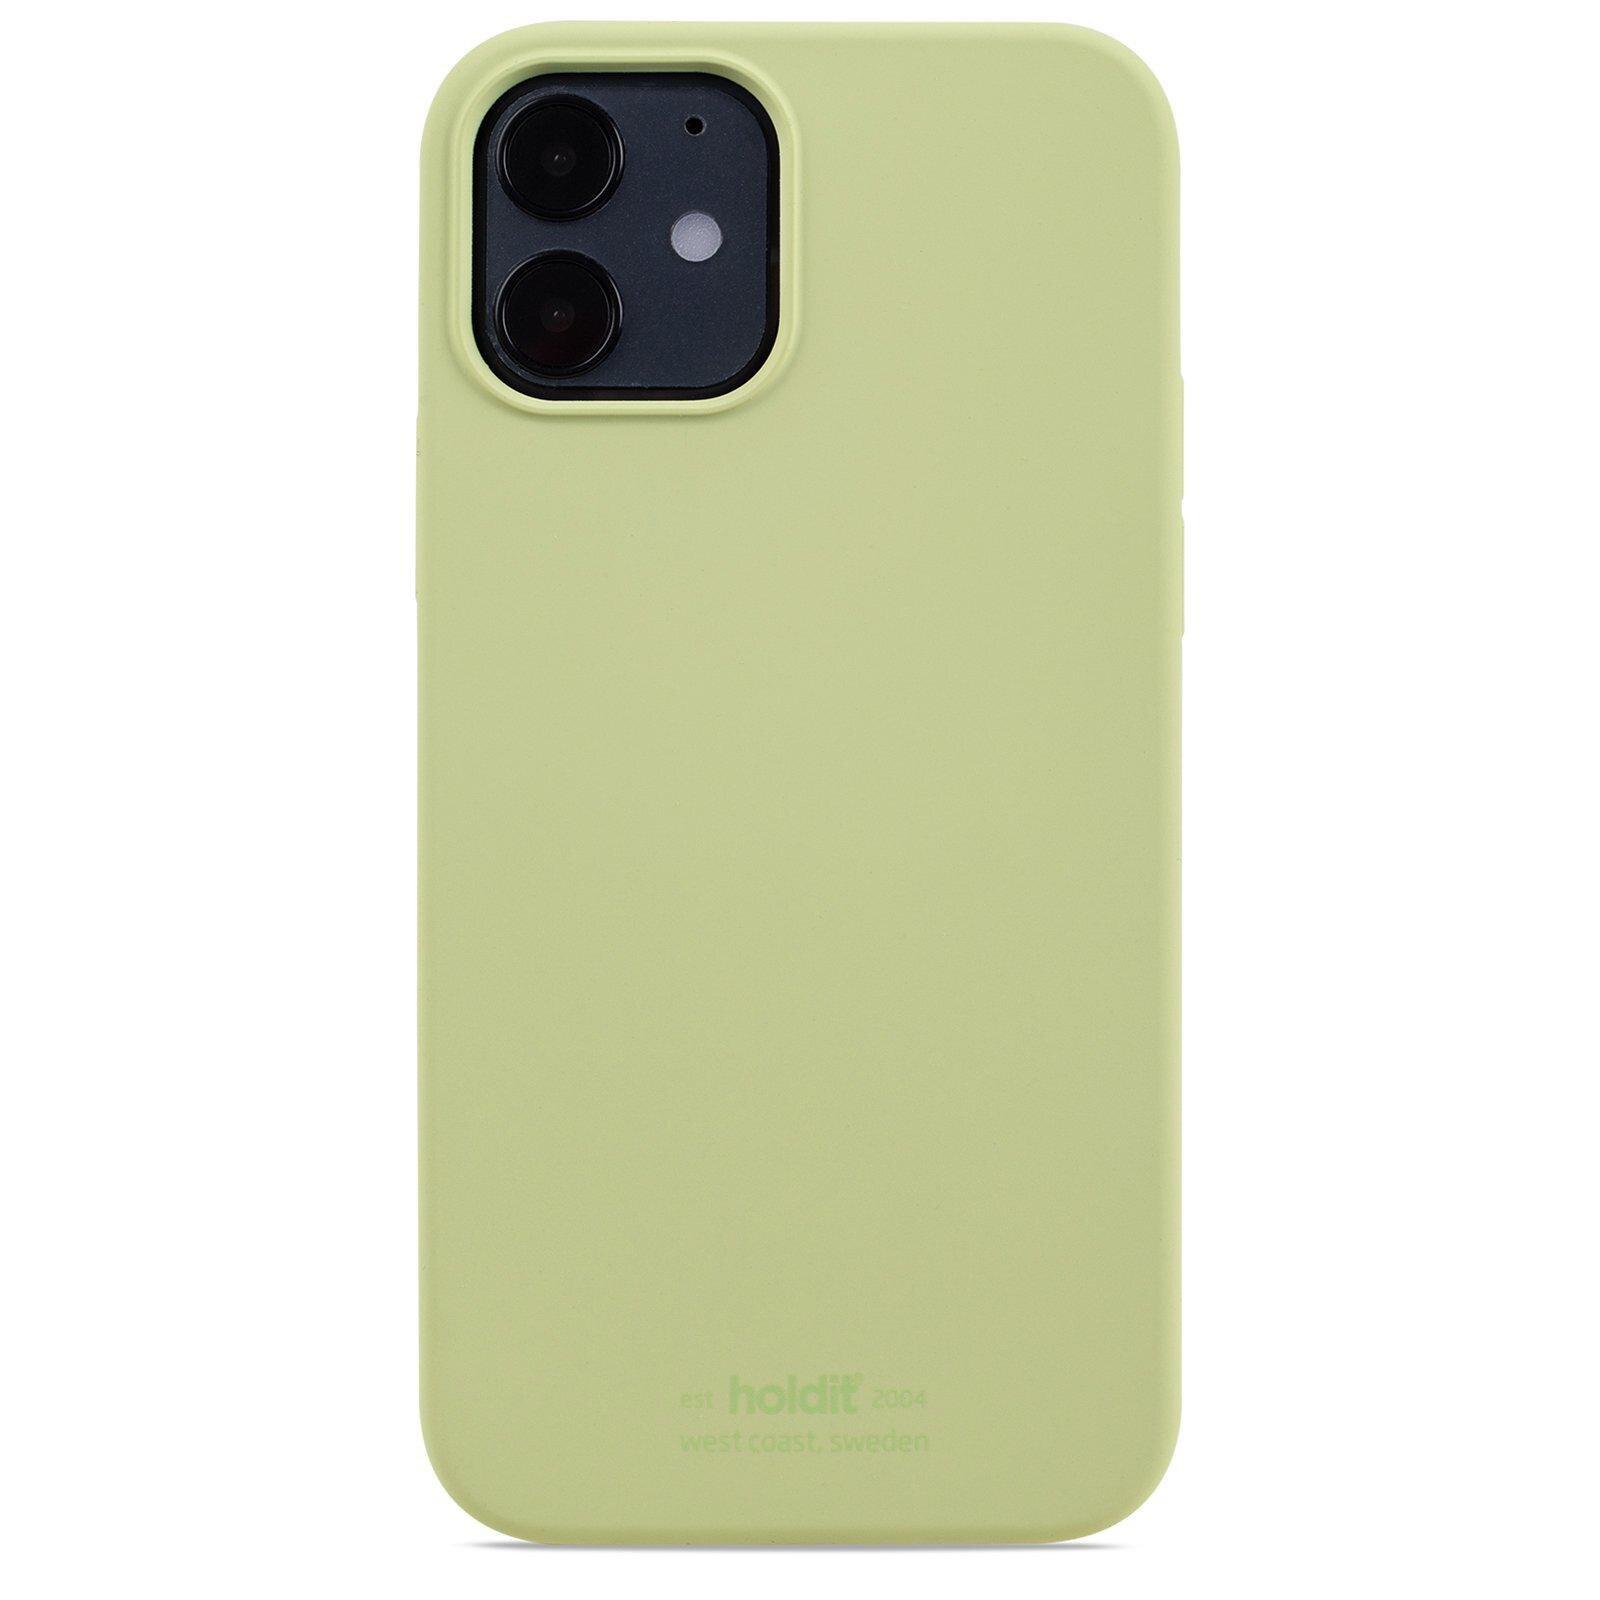 Silikonikuori iPhone 12/12 Pro Kiwi